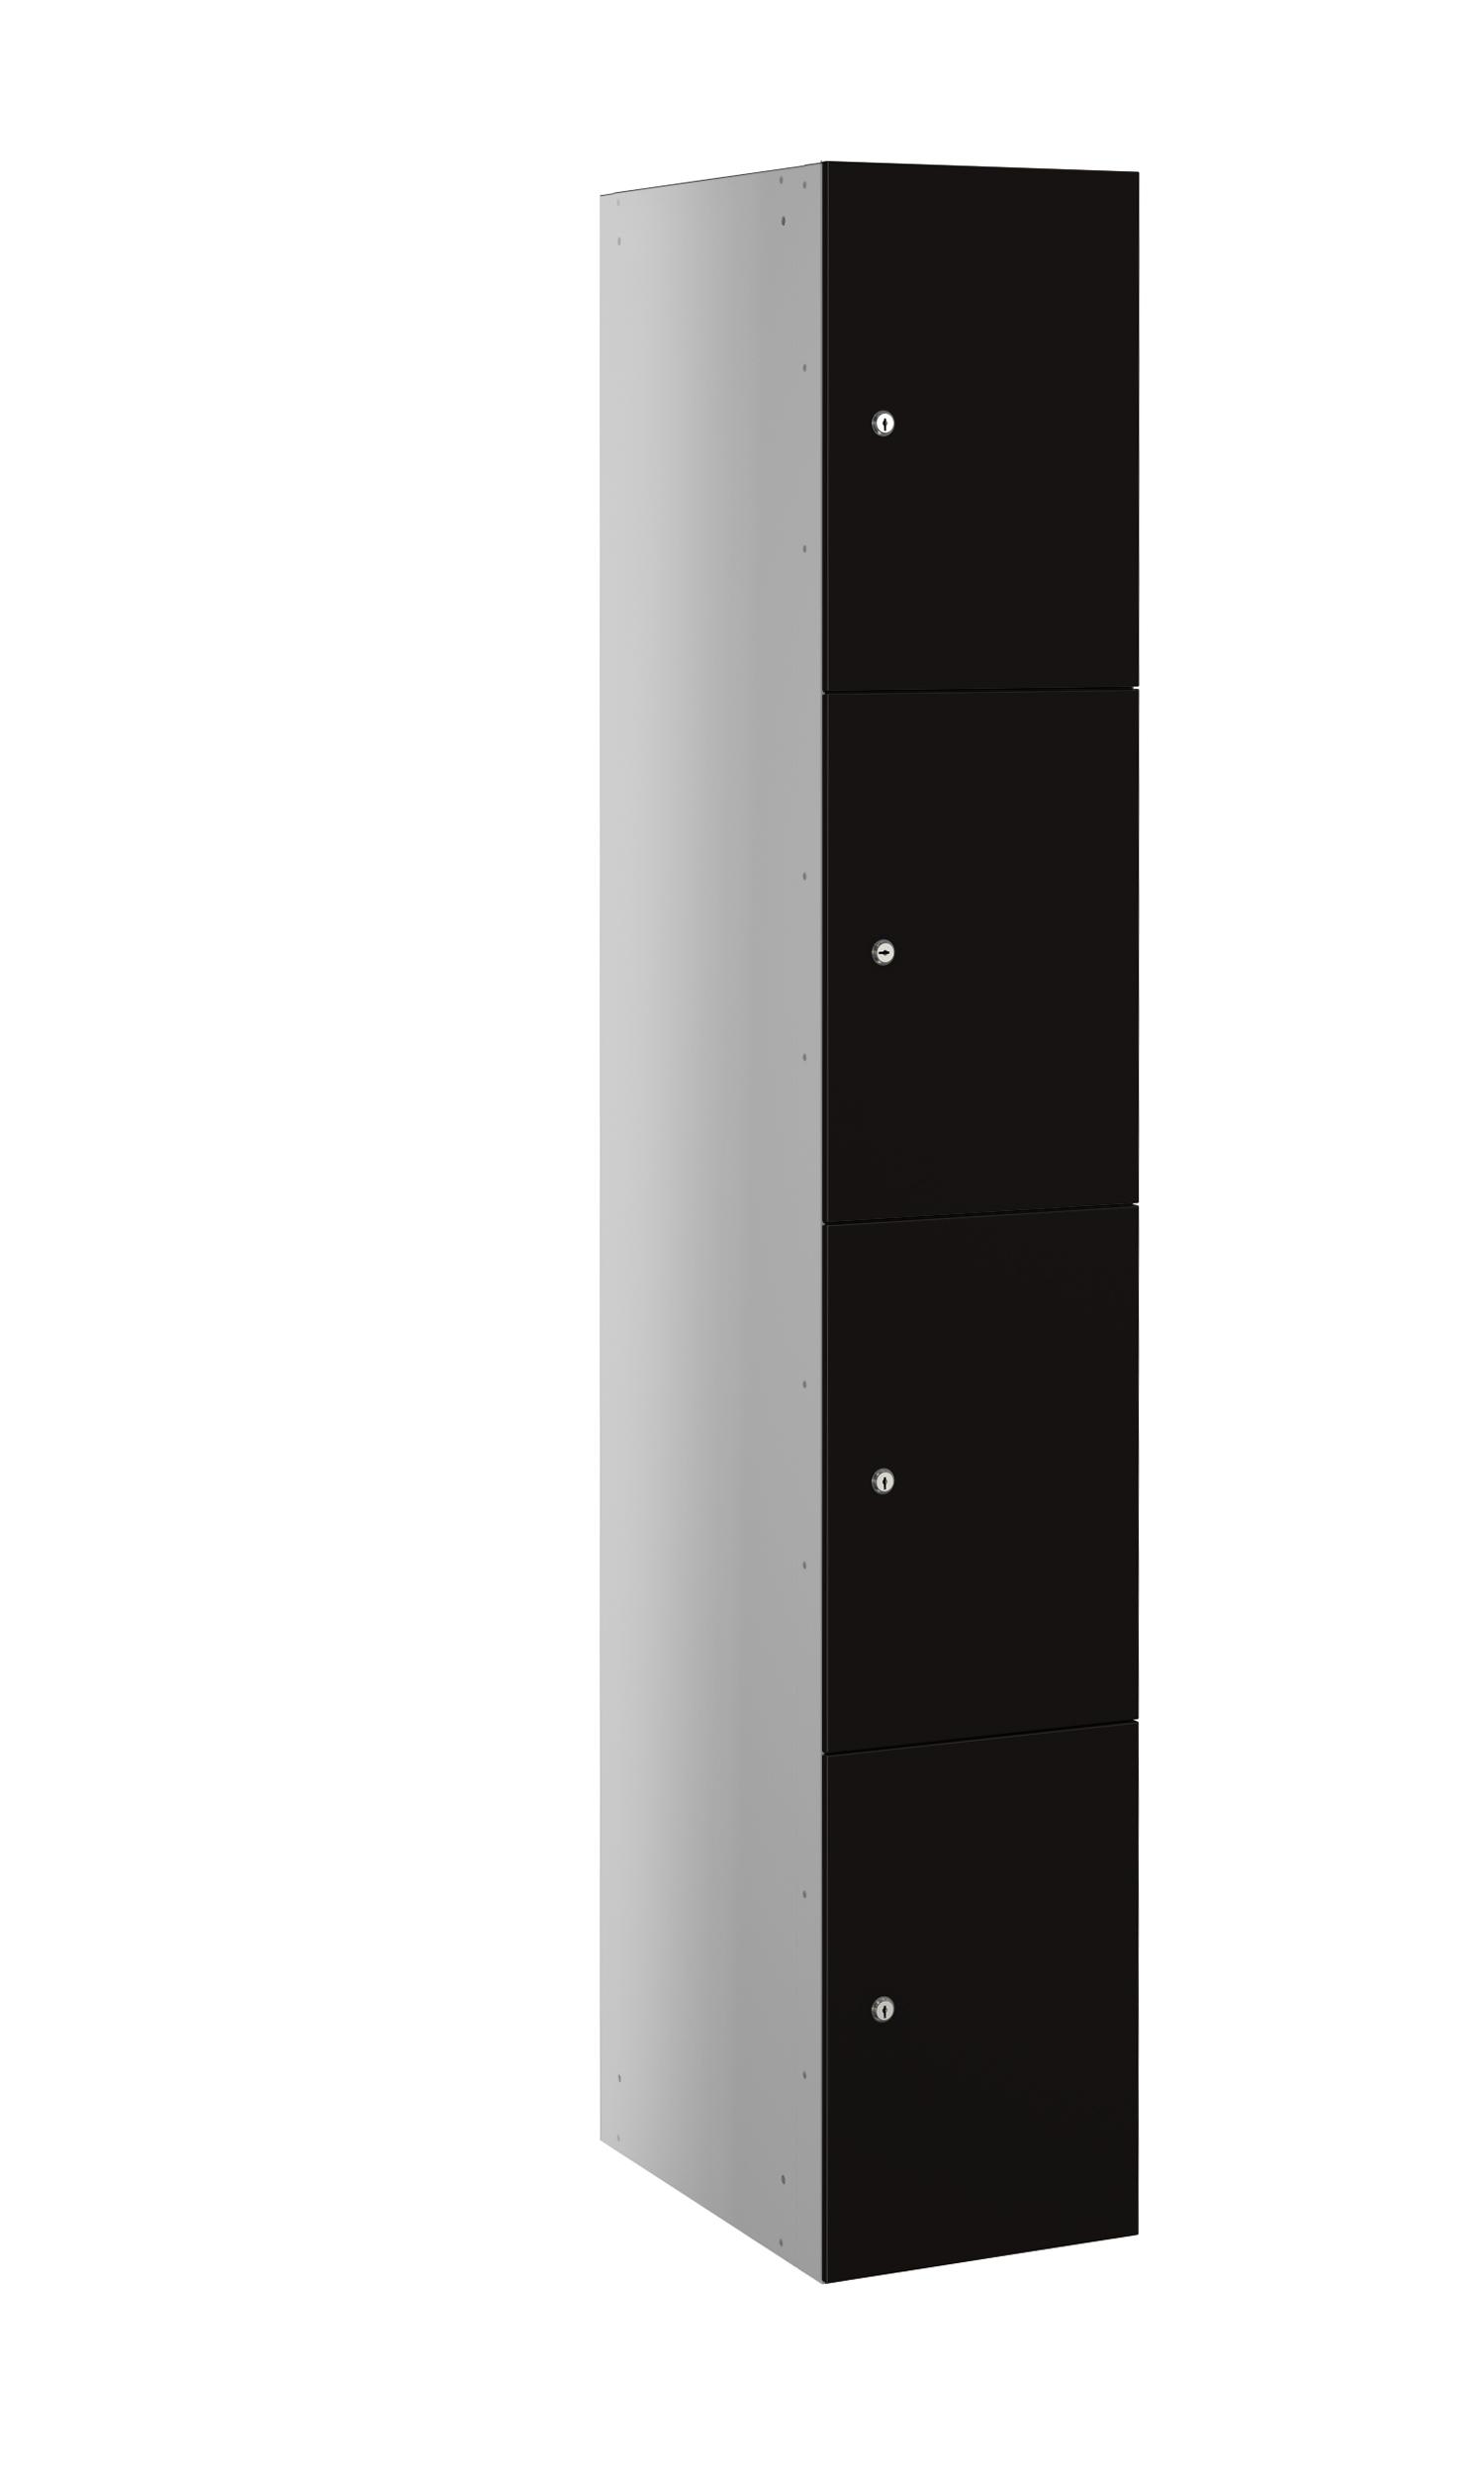 Probe buzzbox laminate 4 doors anthracite